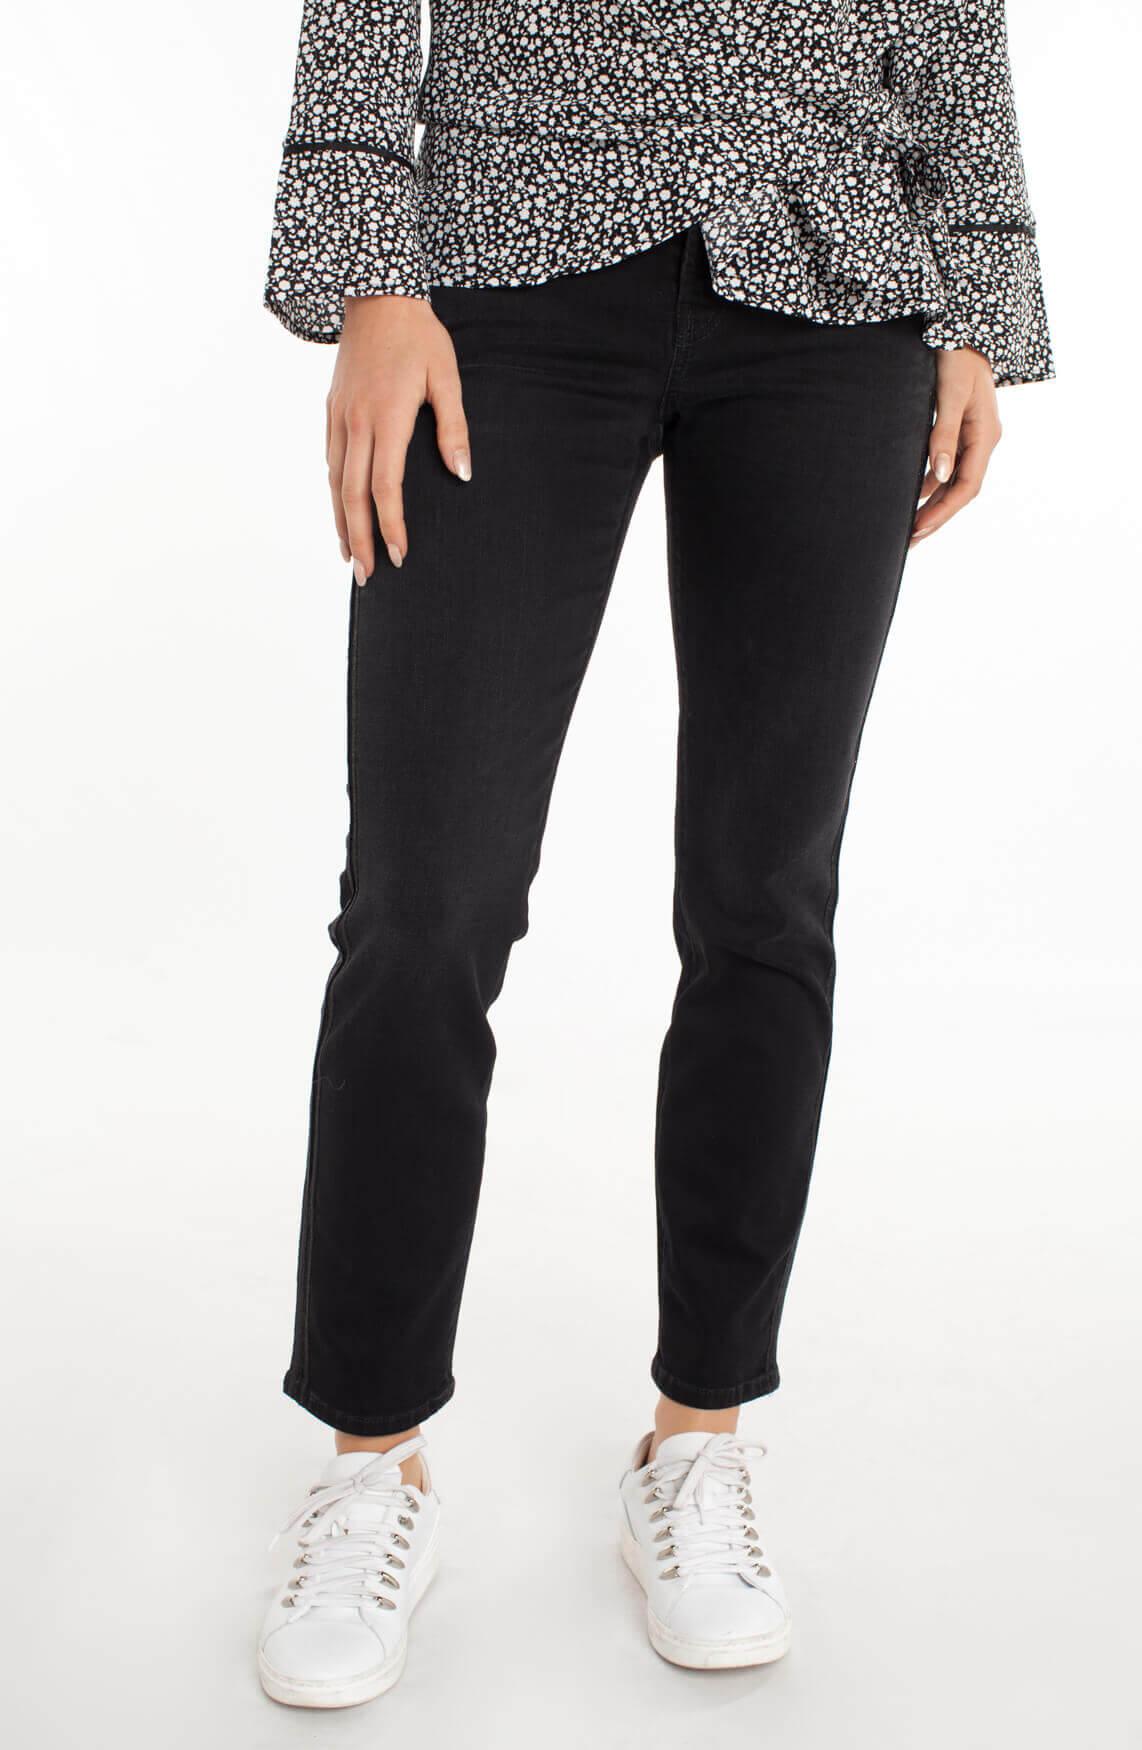 Cambio Dames Liu jeans met glitterbies zwart